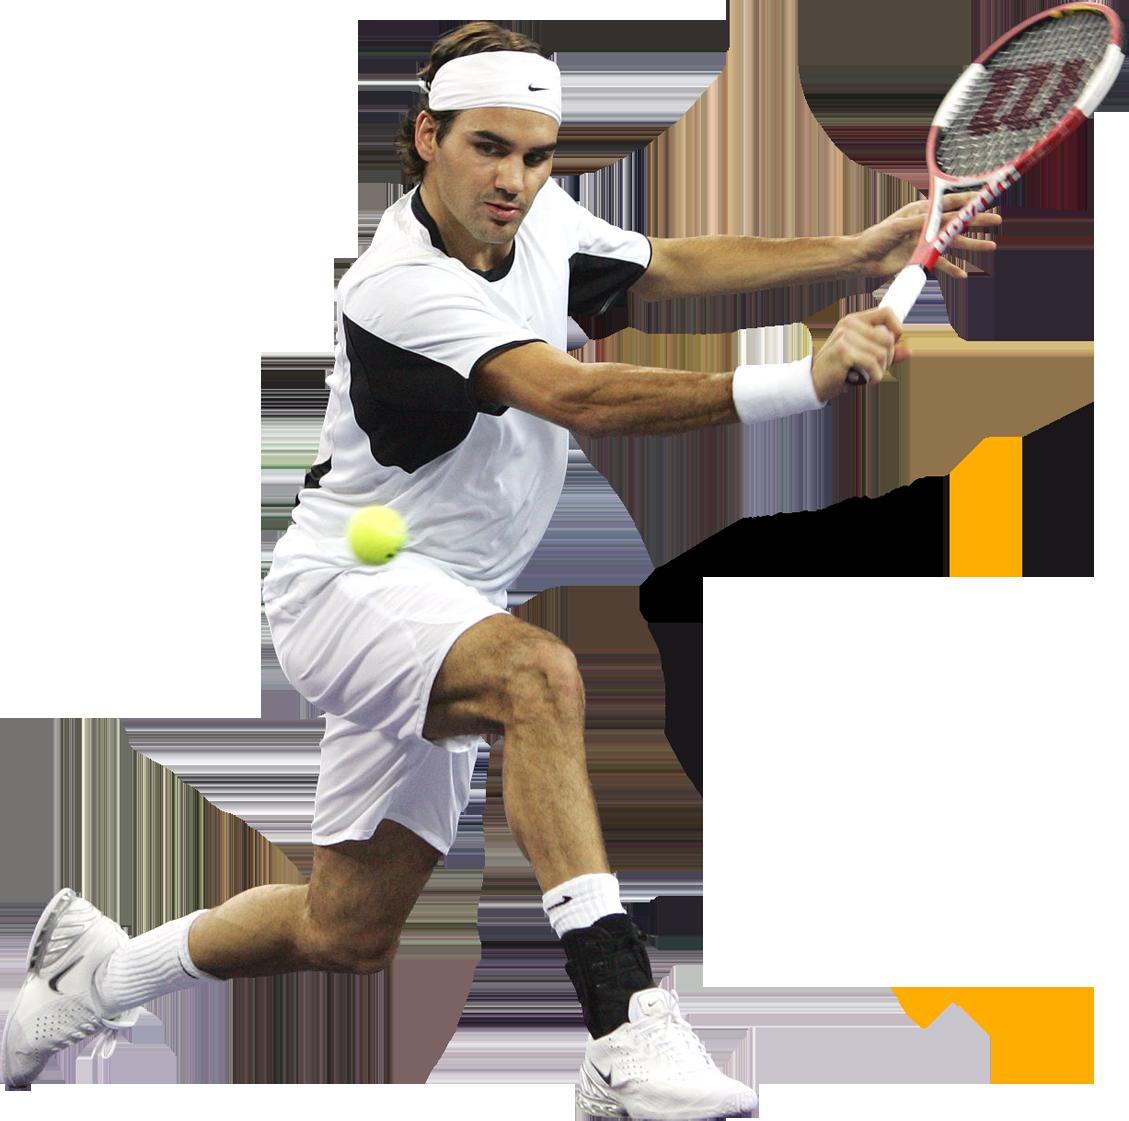 Png image purepng free. Man clipart tennis